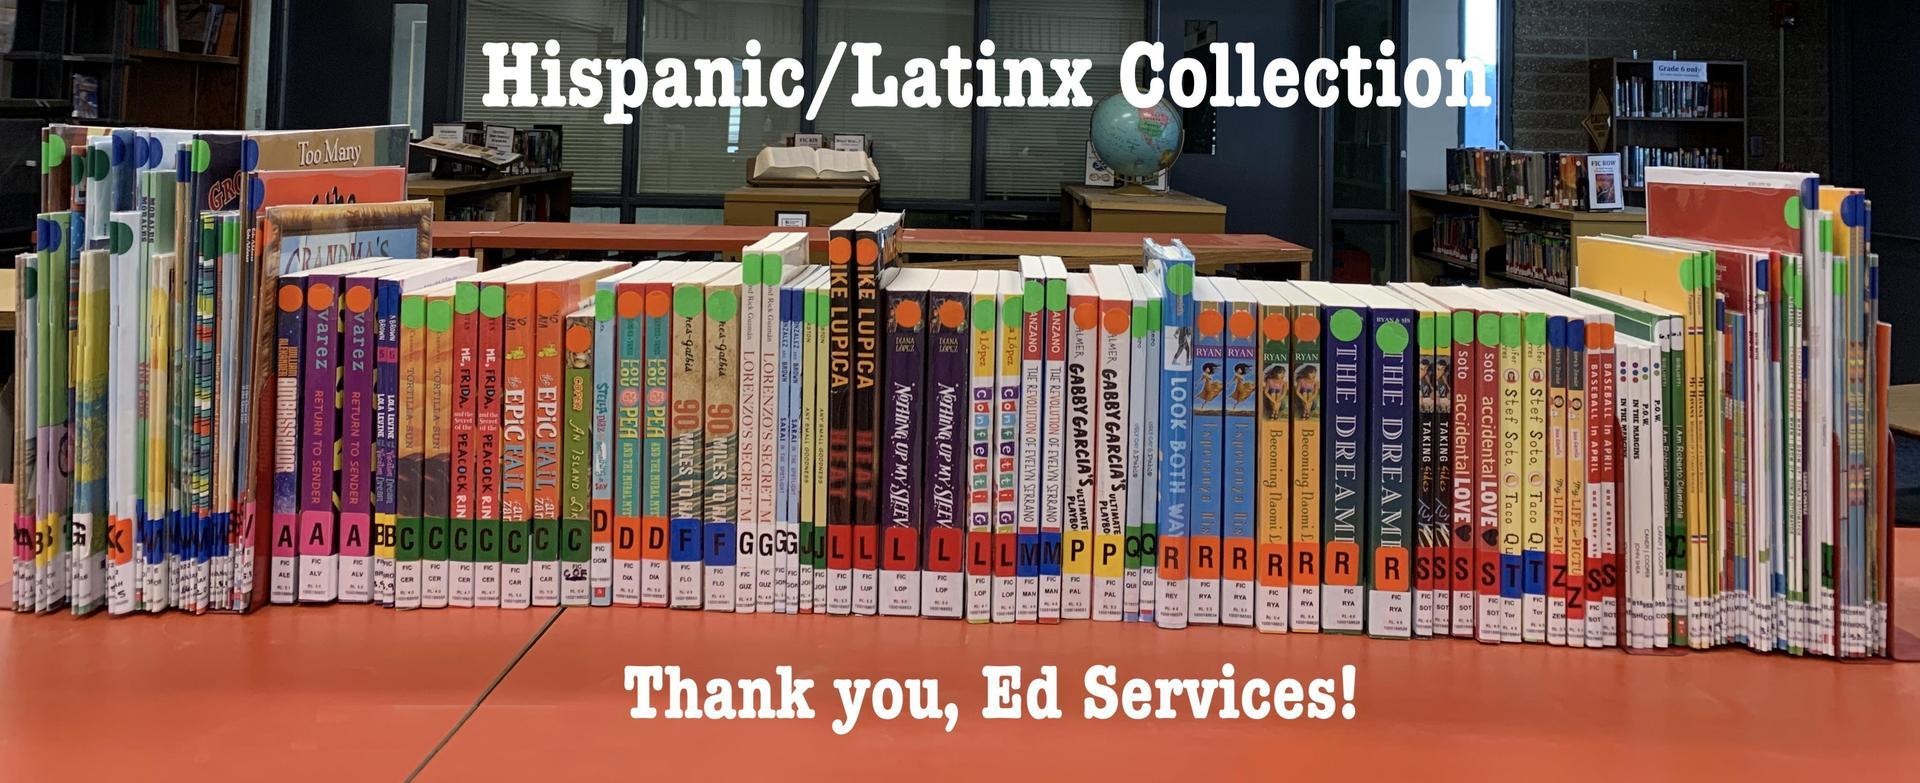 Hispanic Latinx Collection